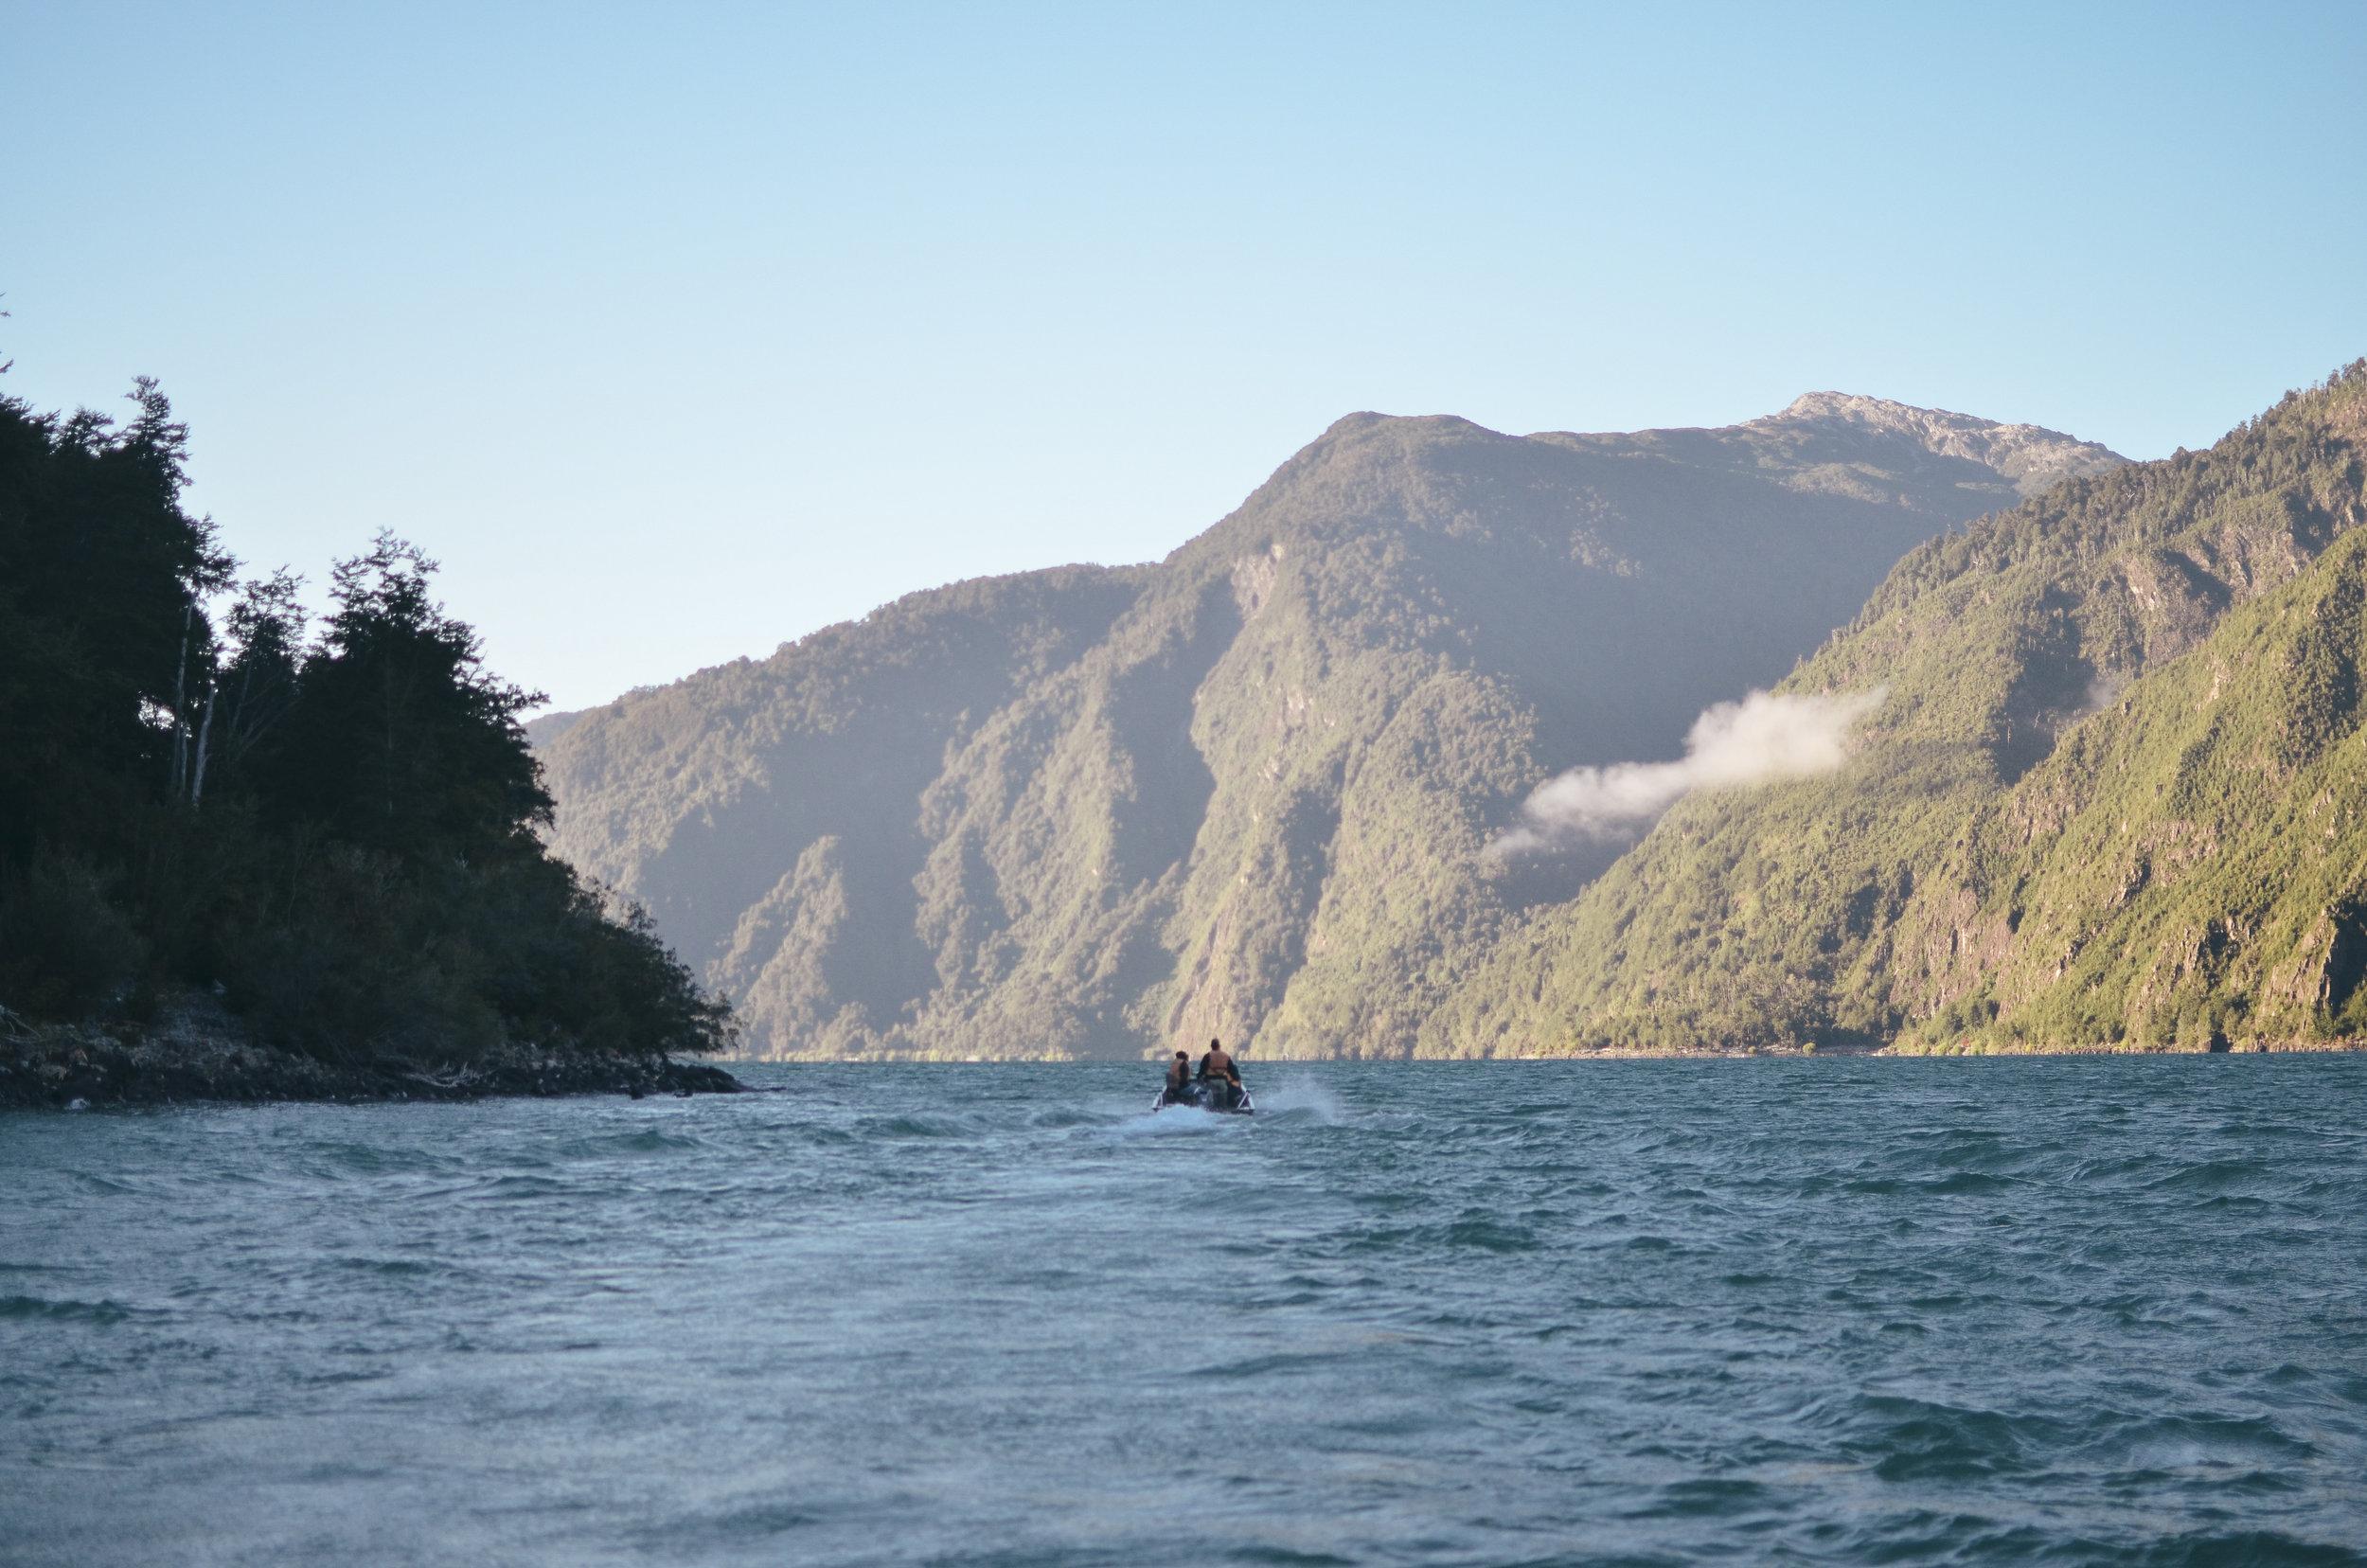 barraco+lodge+chile+life+on+pine+travel+blog+life+on+pine_DSC_1449.jpg